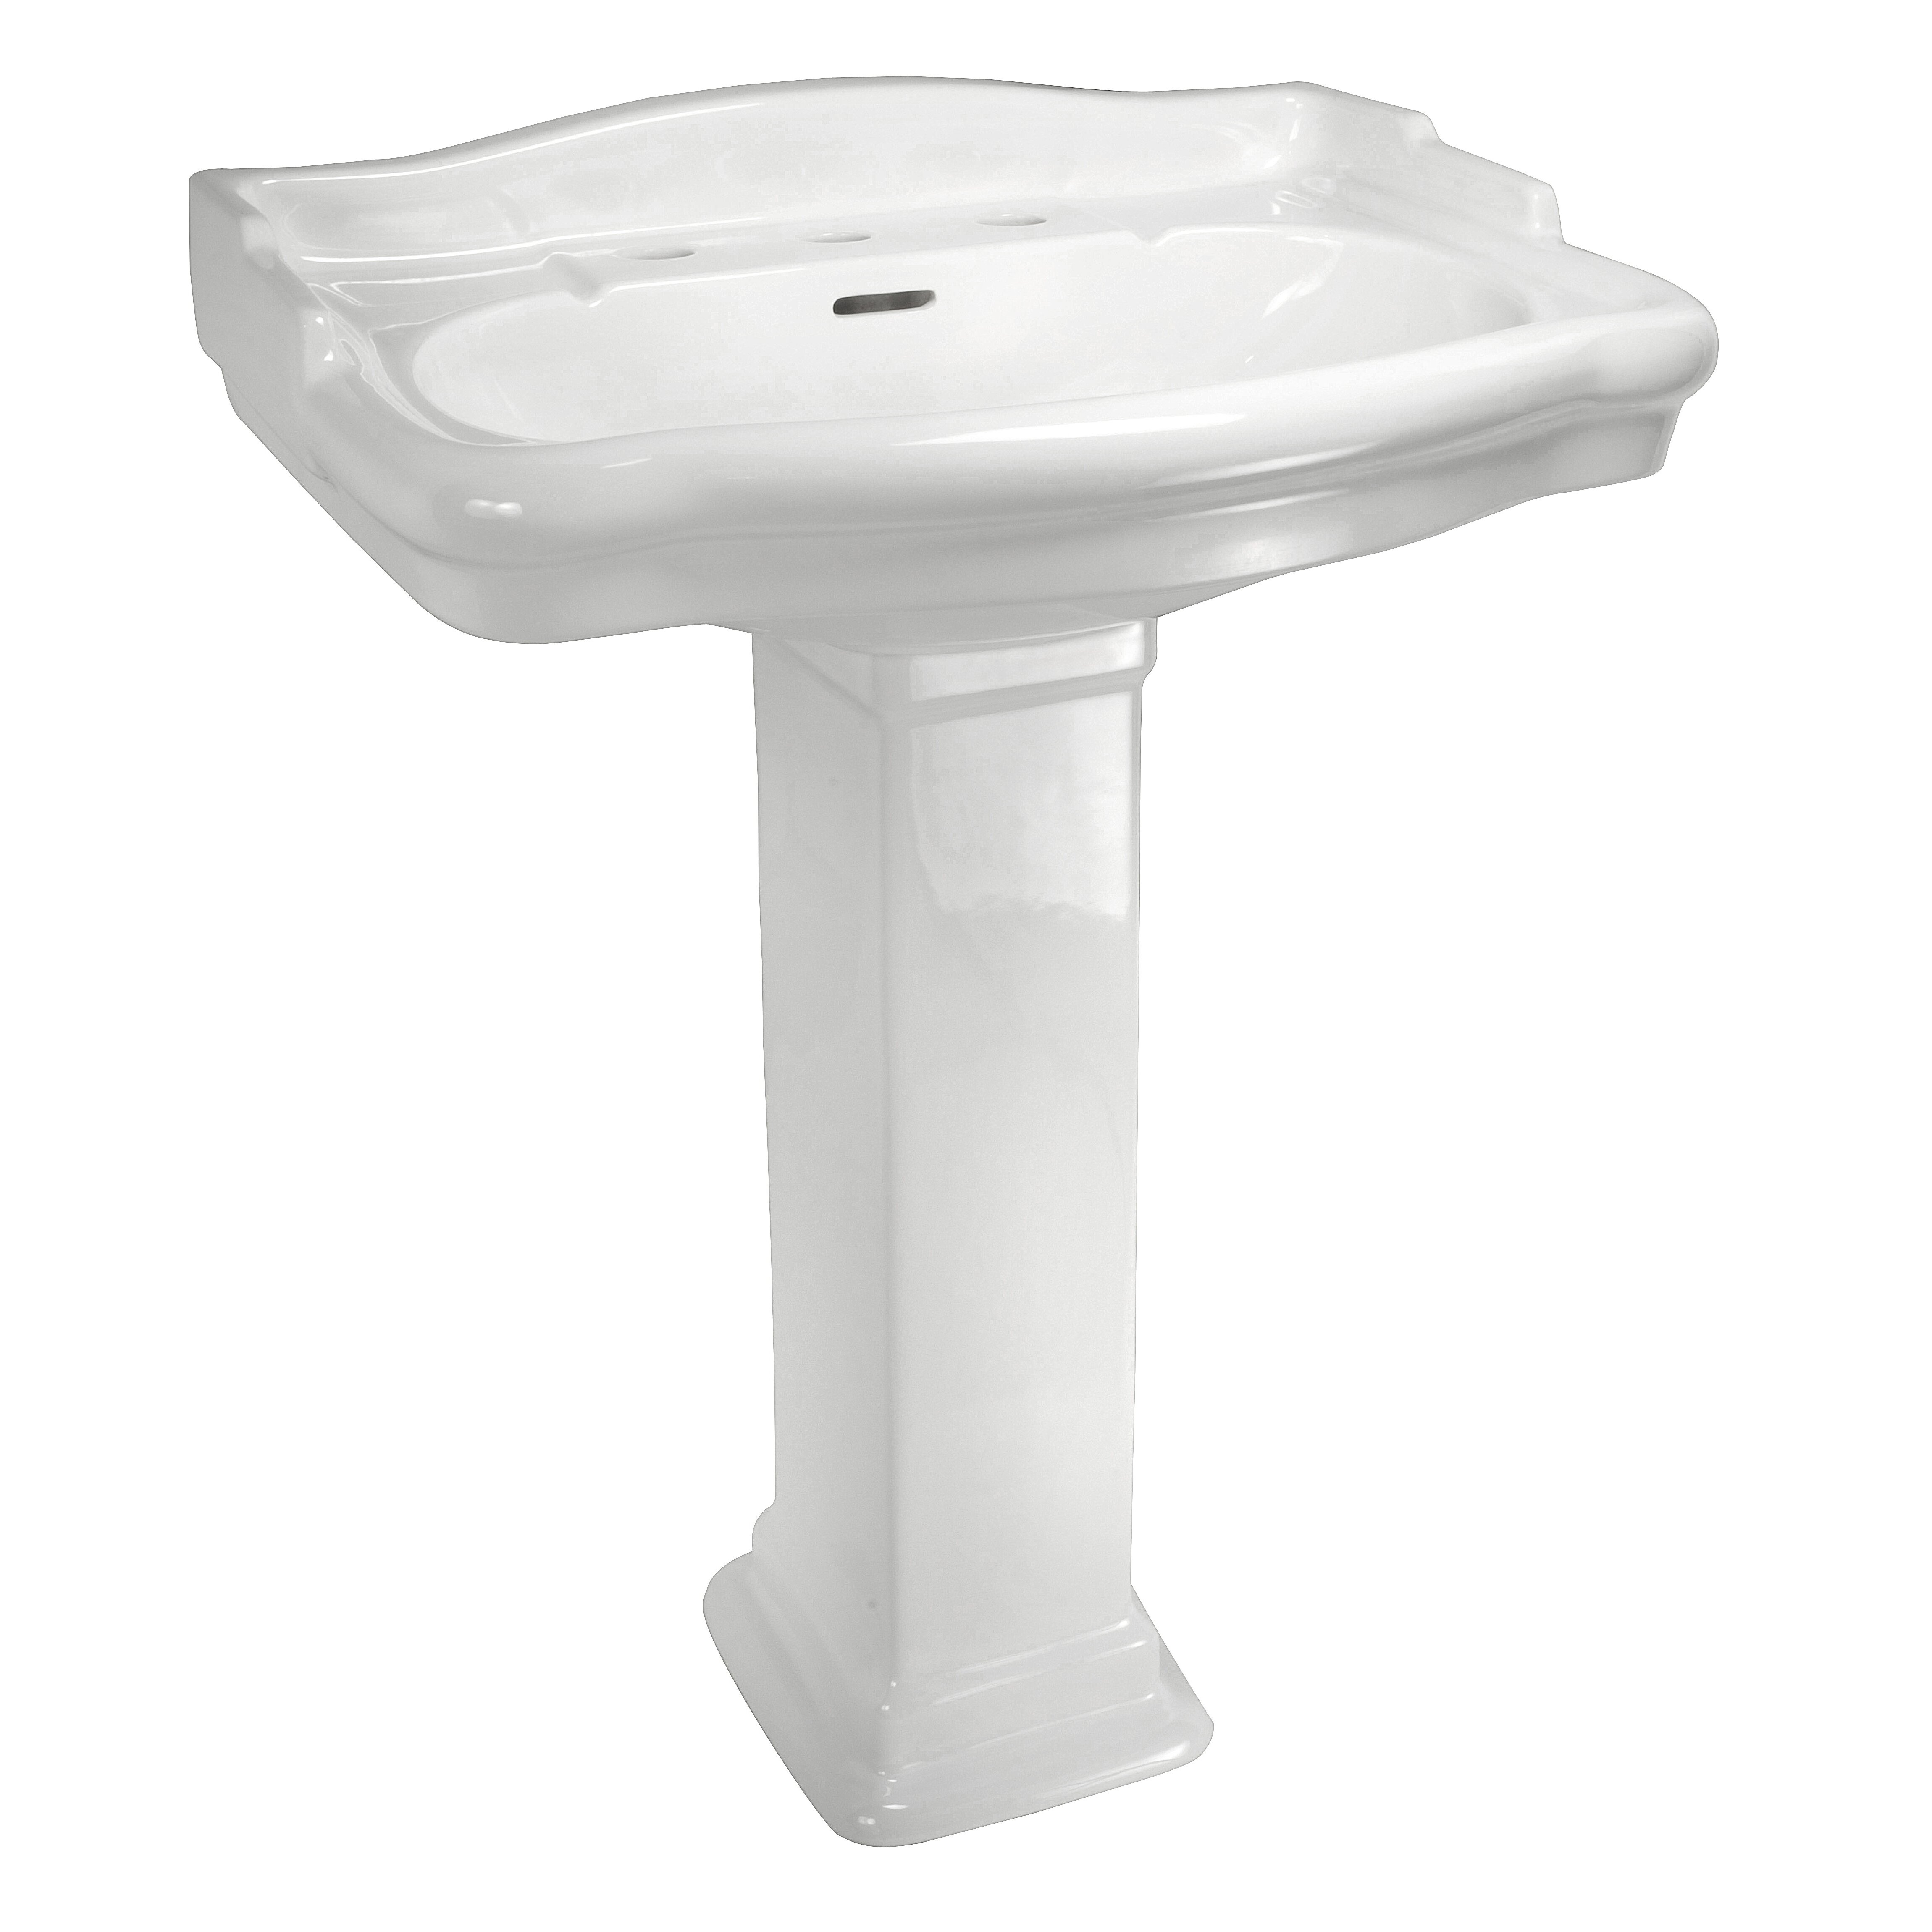 ... Classics English Turn Petite Pedestal Sink Base & Reviews Wayfair